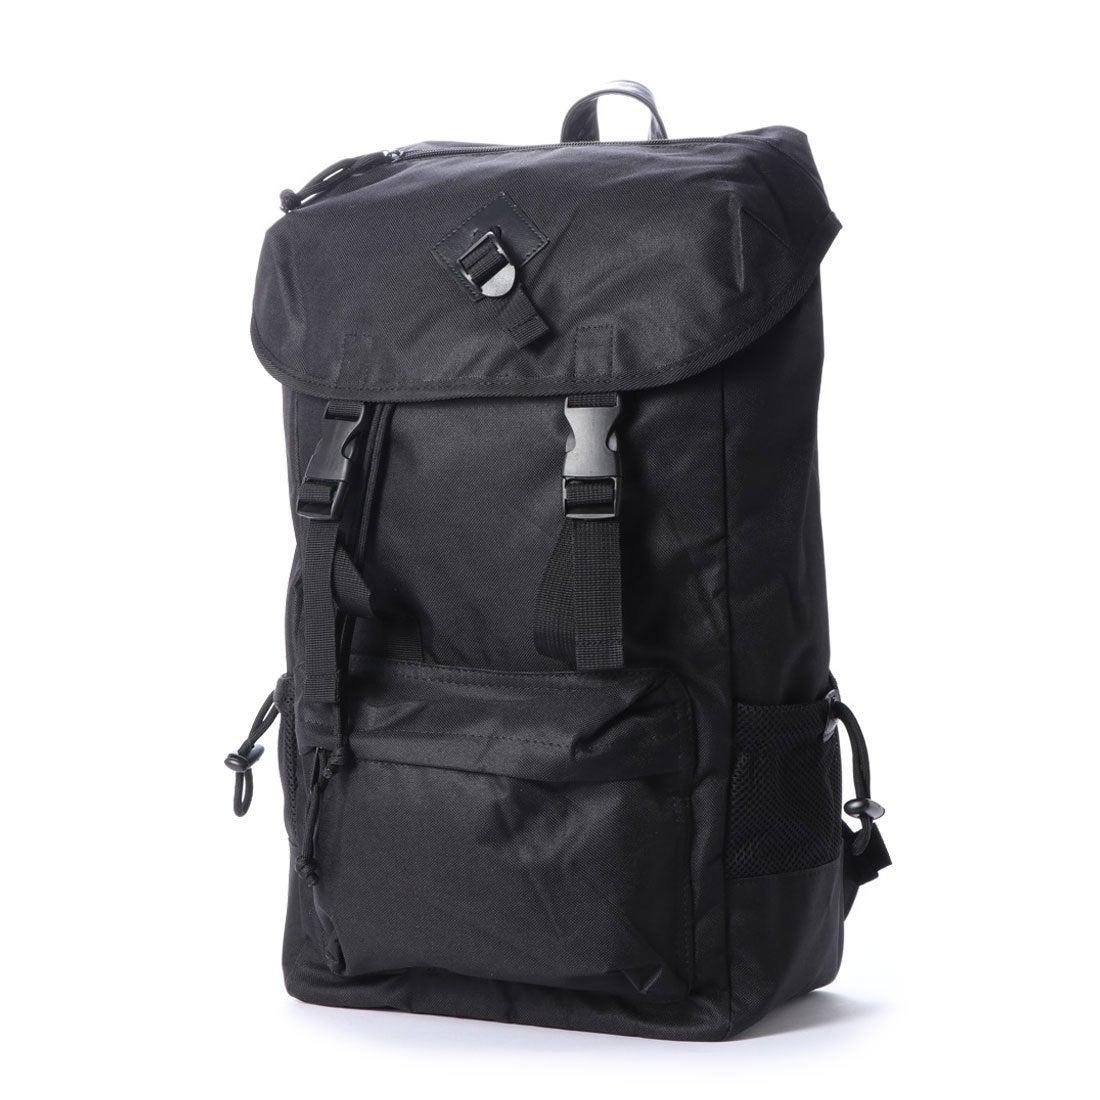 35fe2b1661c8 スタイルブロック STYLEBLOCK ナイロンフラップバックパック (ブラック) -靴&ファッション通販 ロコンド〜自宅で試着、気軽に返品